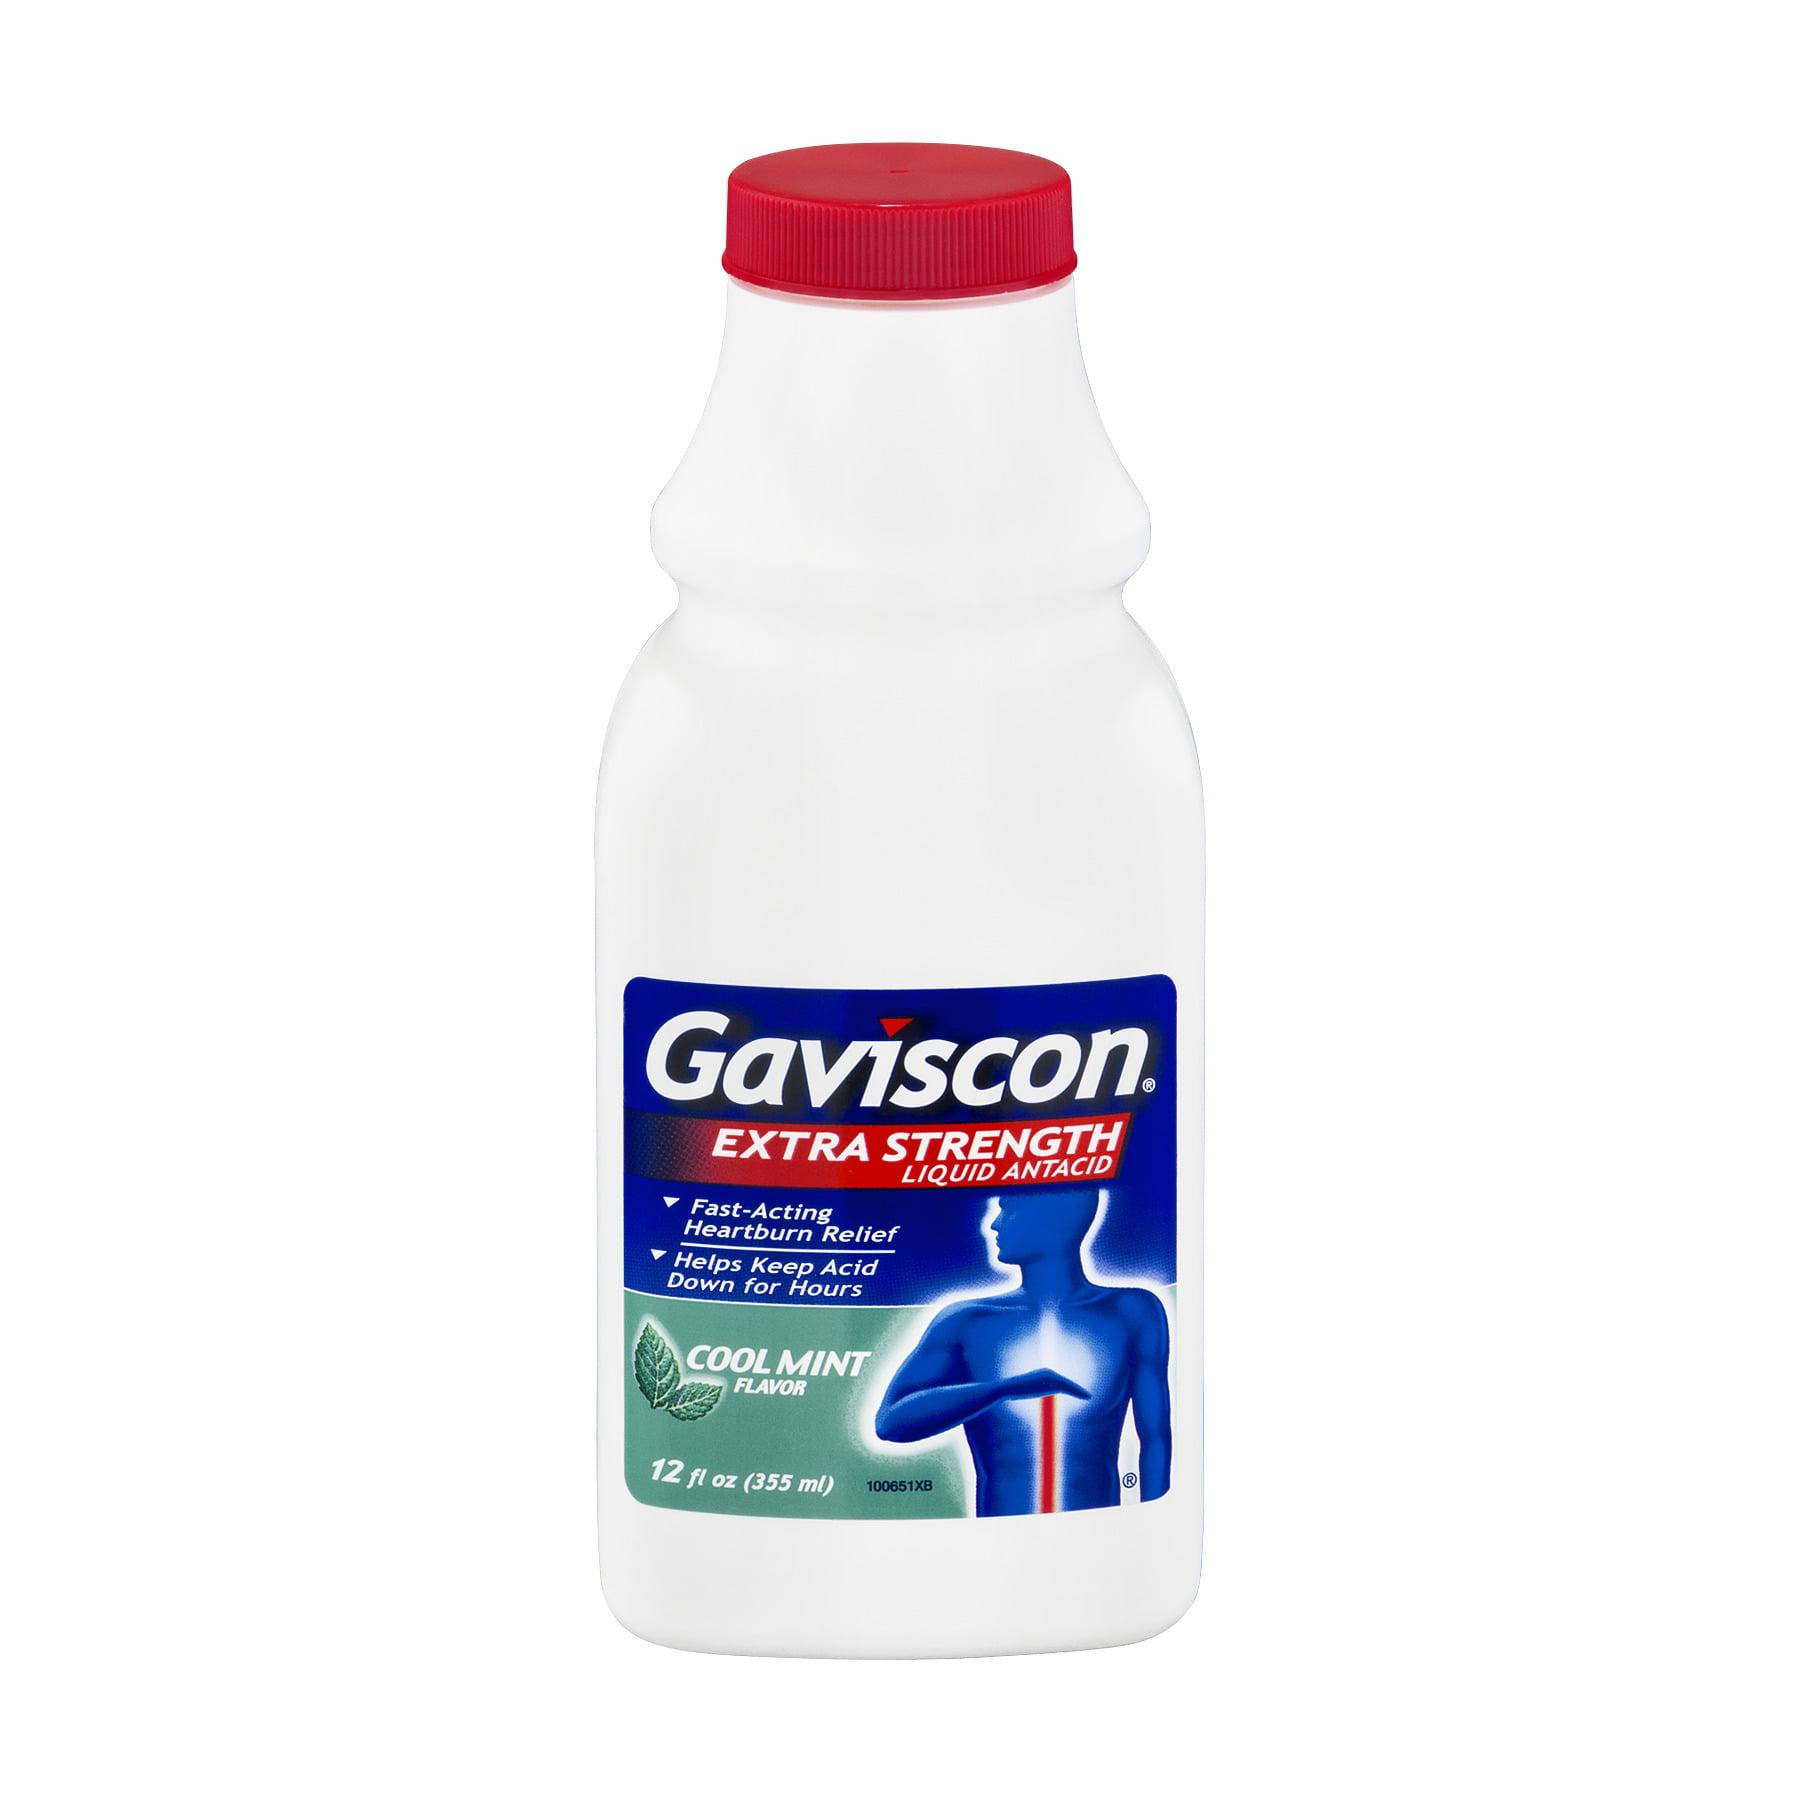 Gaviscon Extra Strength Liquid Antacid Cool Mint, 12.0 FL OZ